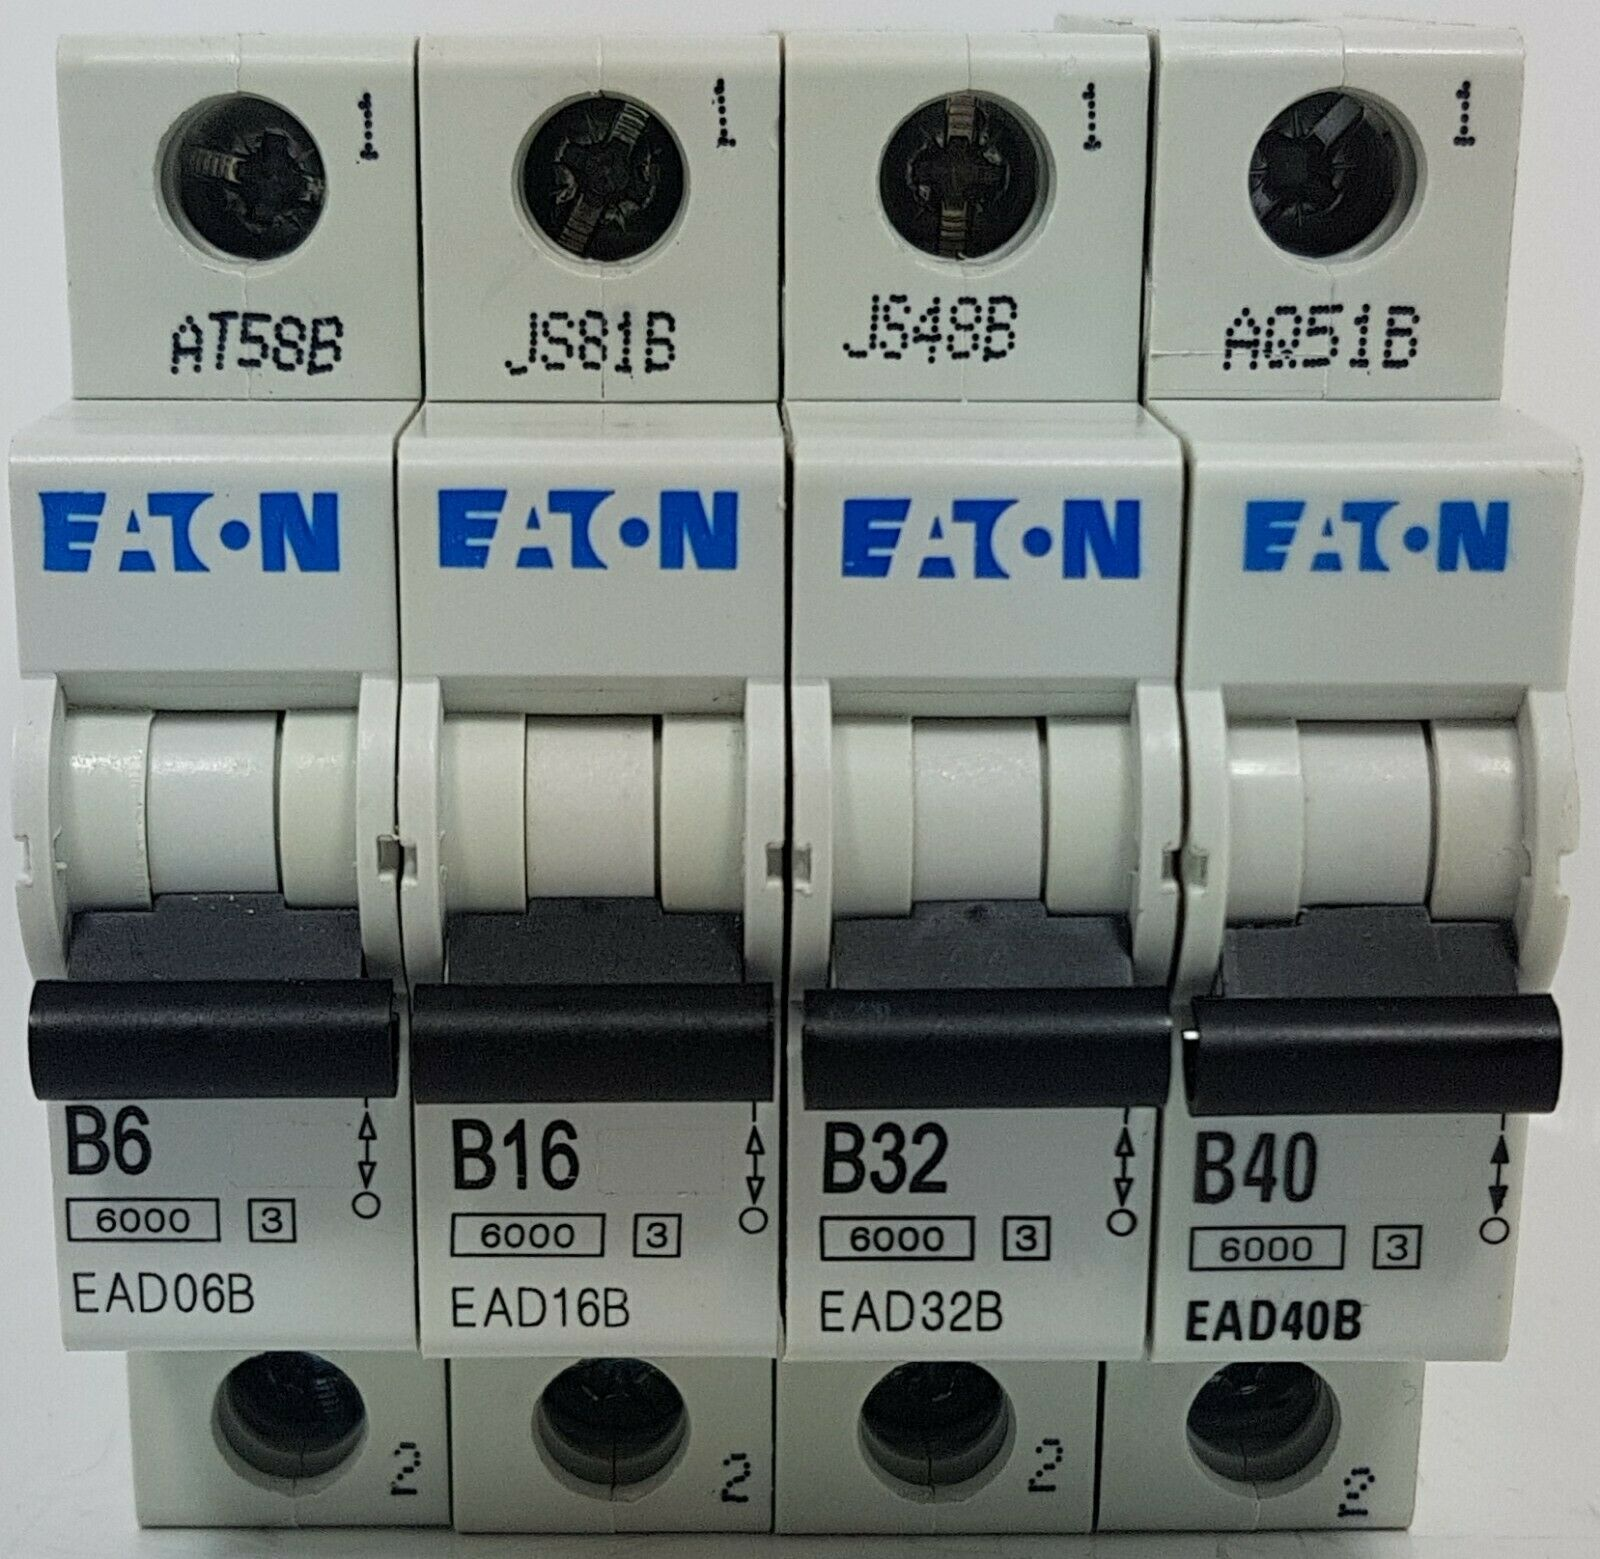 MEM Bill Eaton triple pole mcb Type B /& C /& 2 /& 3 6A  10A  16A  40A  63A mcb